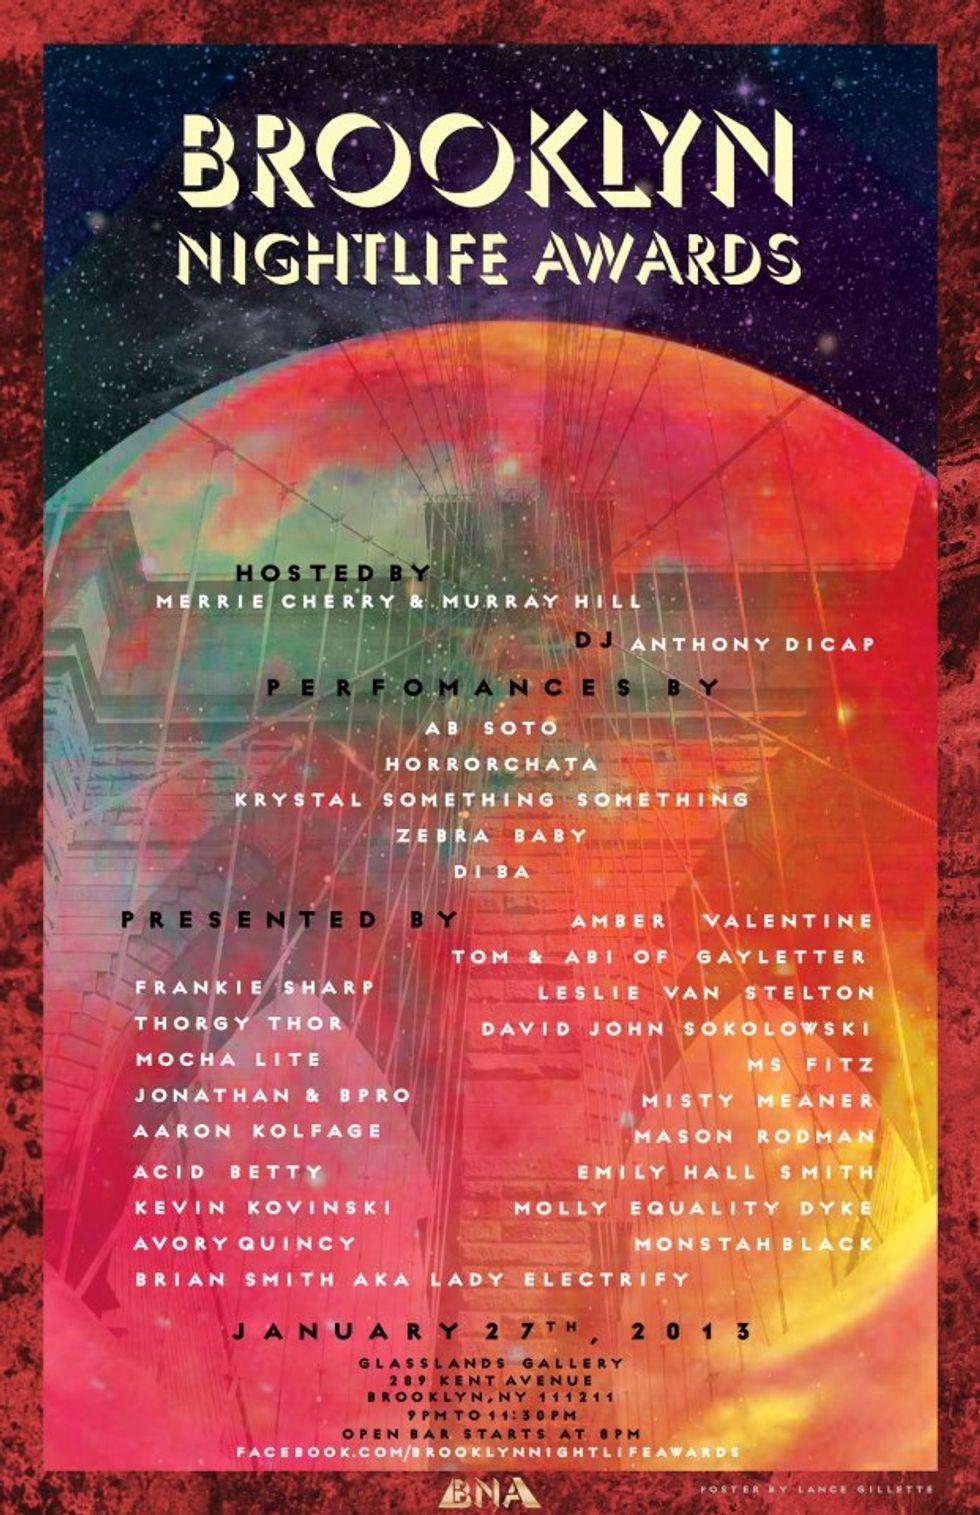 Brooklyn Nightlife Awards: Here's All the Winners!